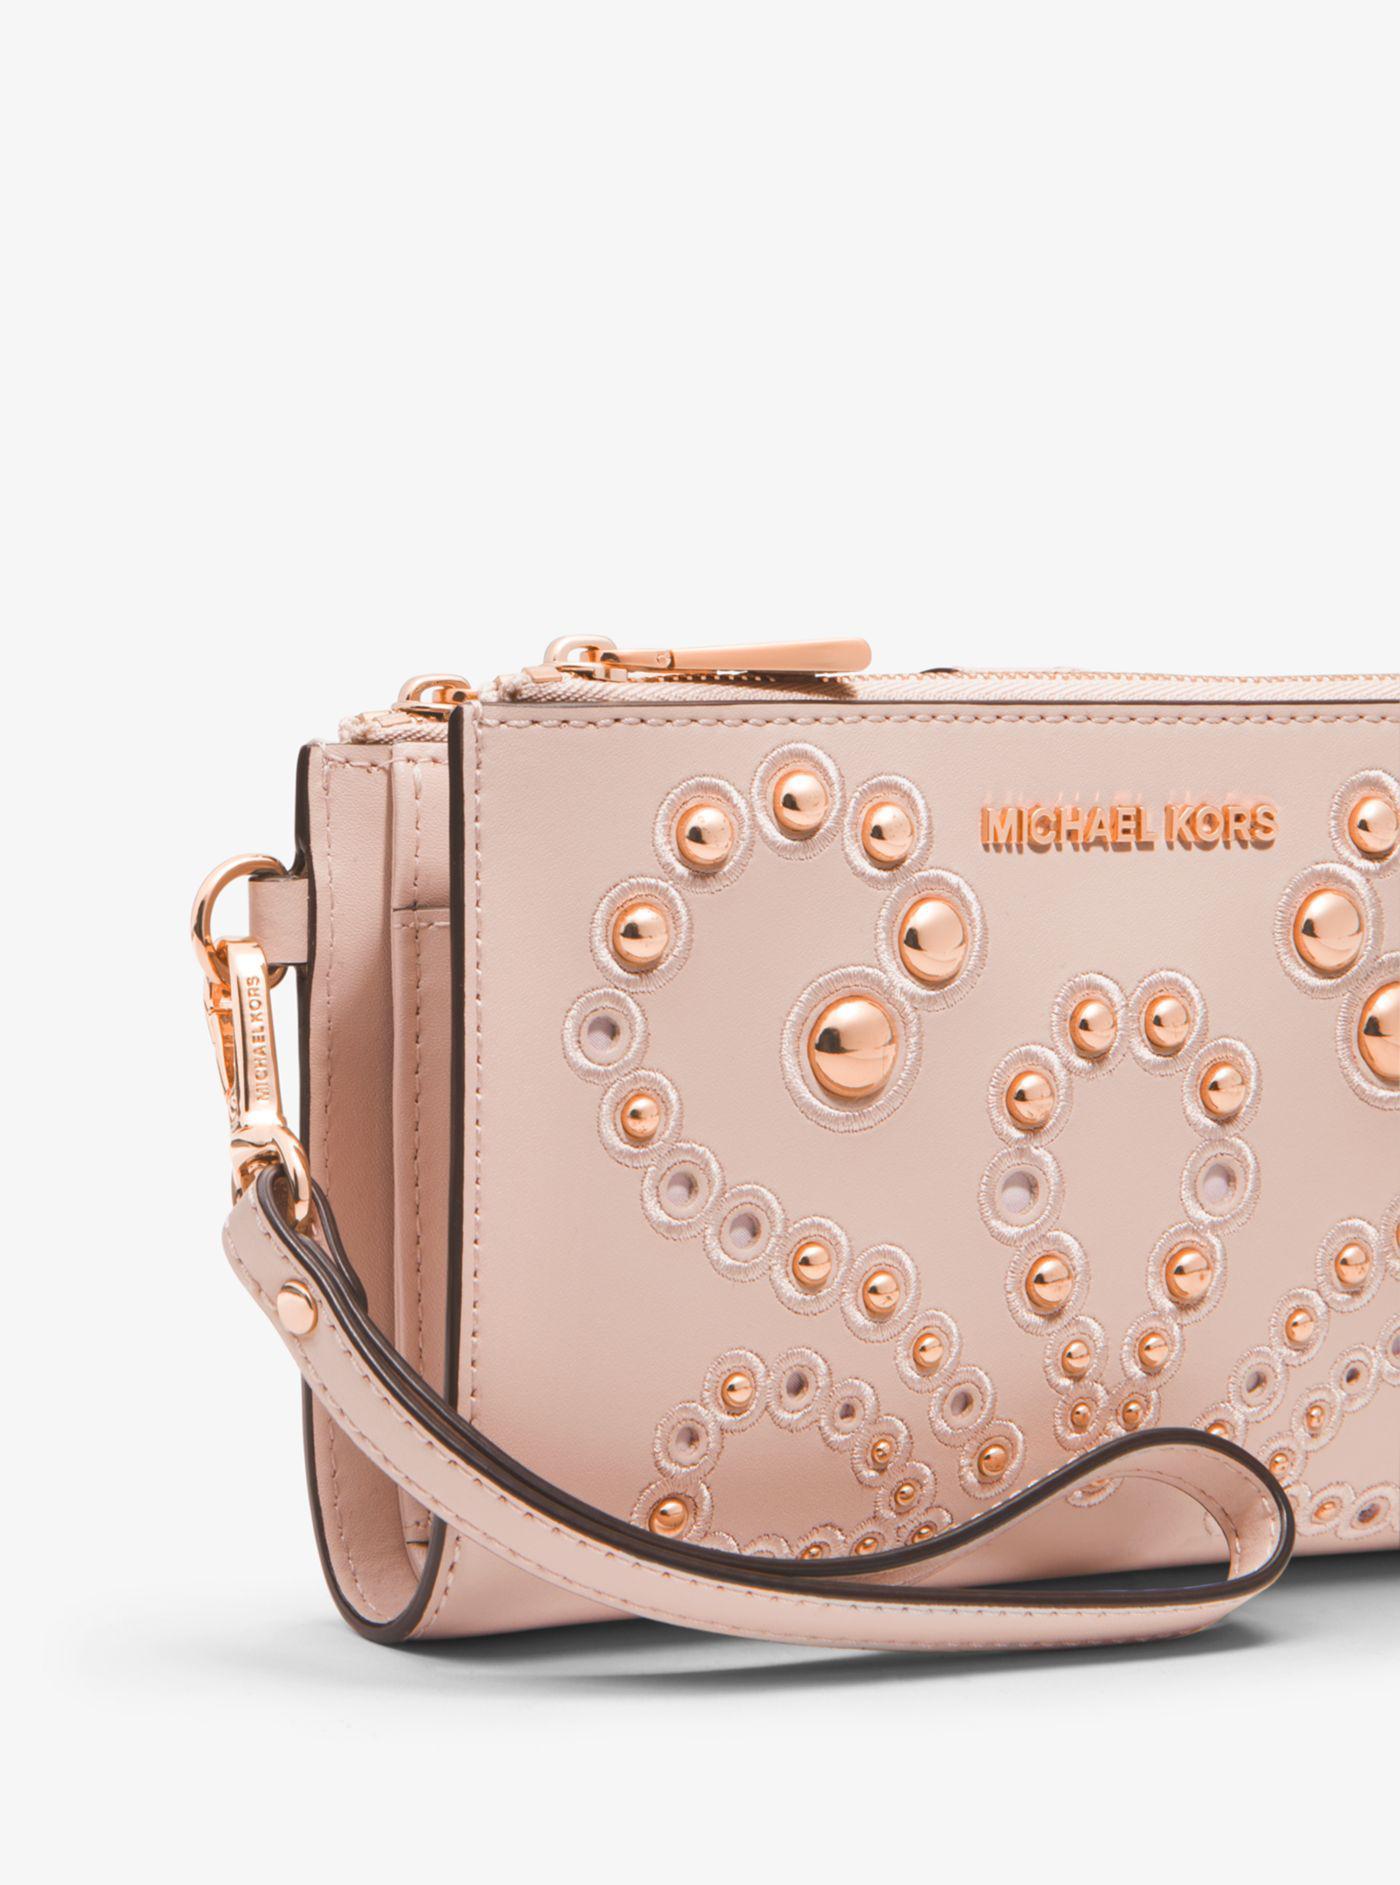 192d0f262fe1 Michael Kors Adele Embellished Leather Smartphone Wallet in Pink - Lyst